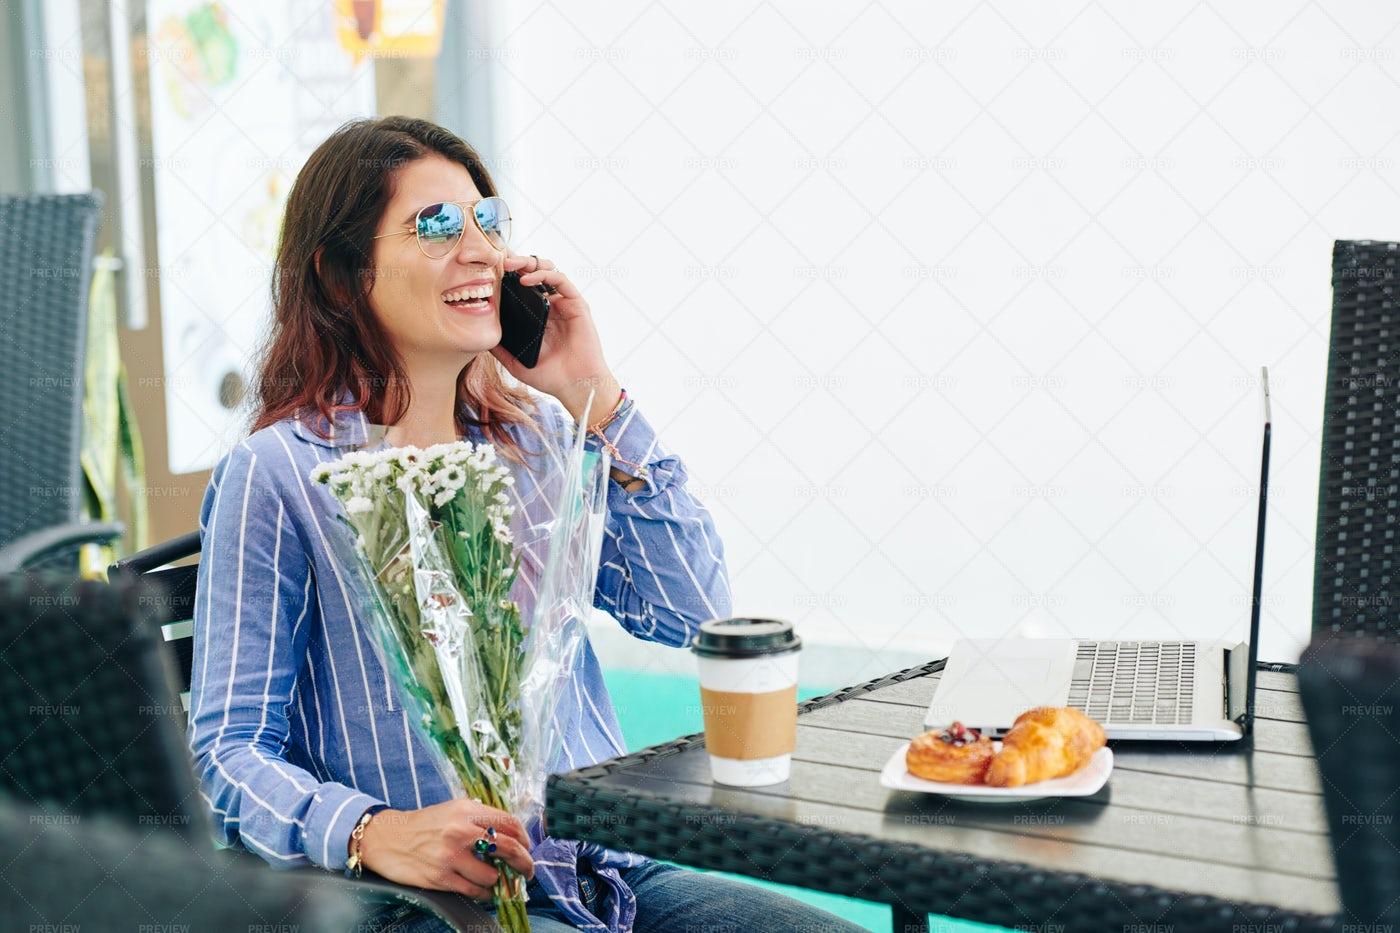 Happy Woman Talking On Phone: Stock Photos